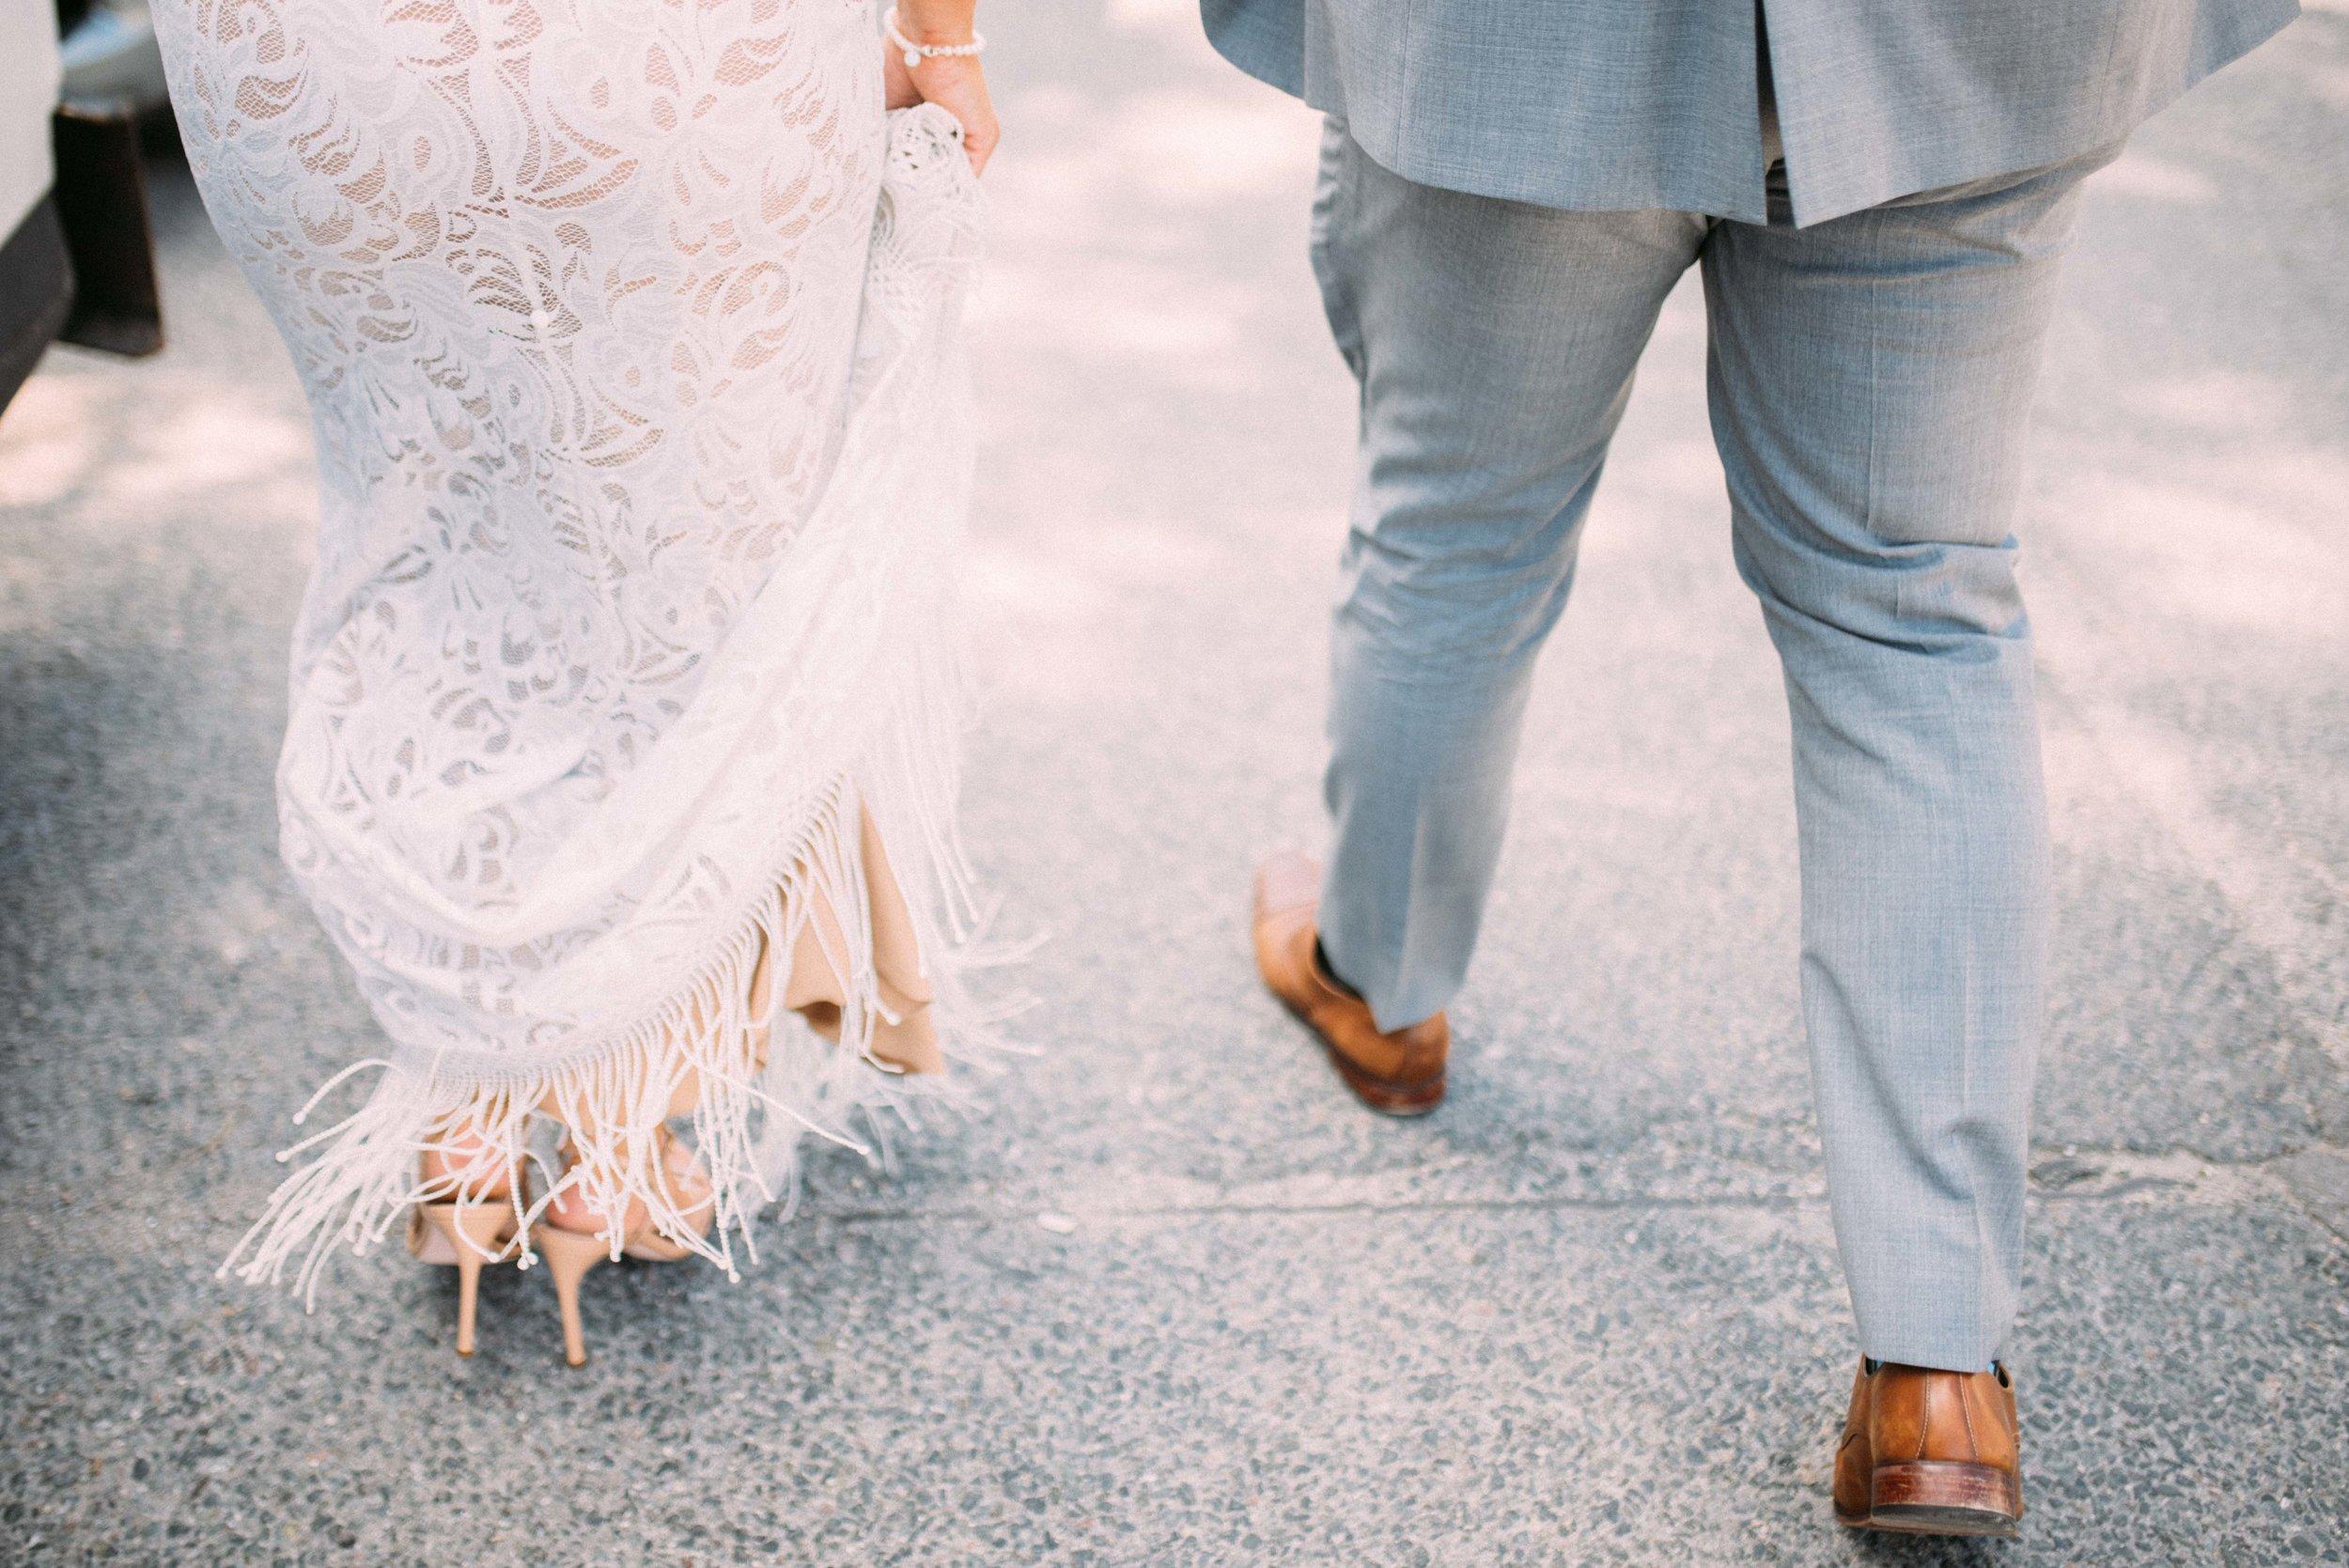 Toronto wedding photography with soundslikeyellowphotography